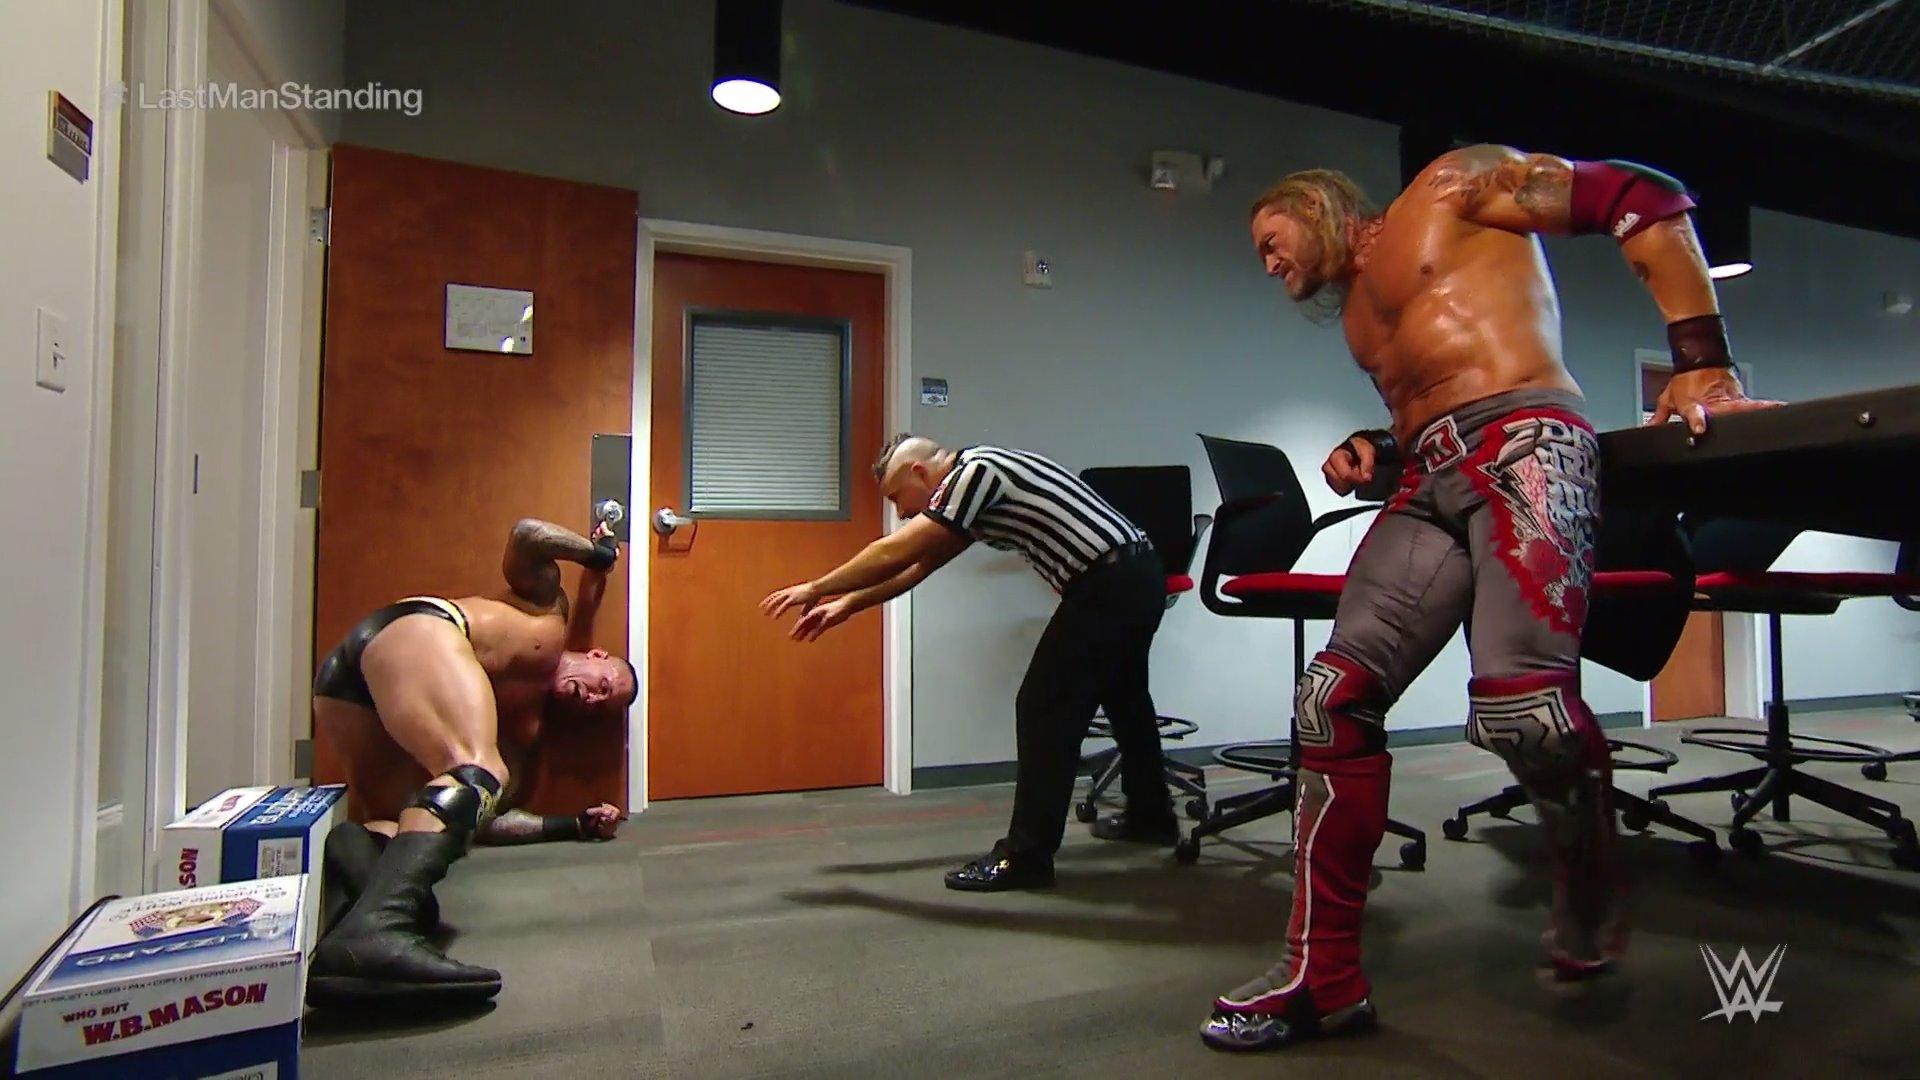 WWE Wrestlemania 36 Night II Results: April 5, 2020 2